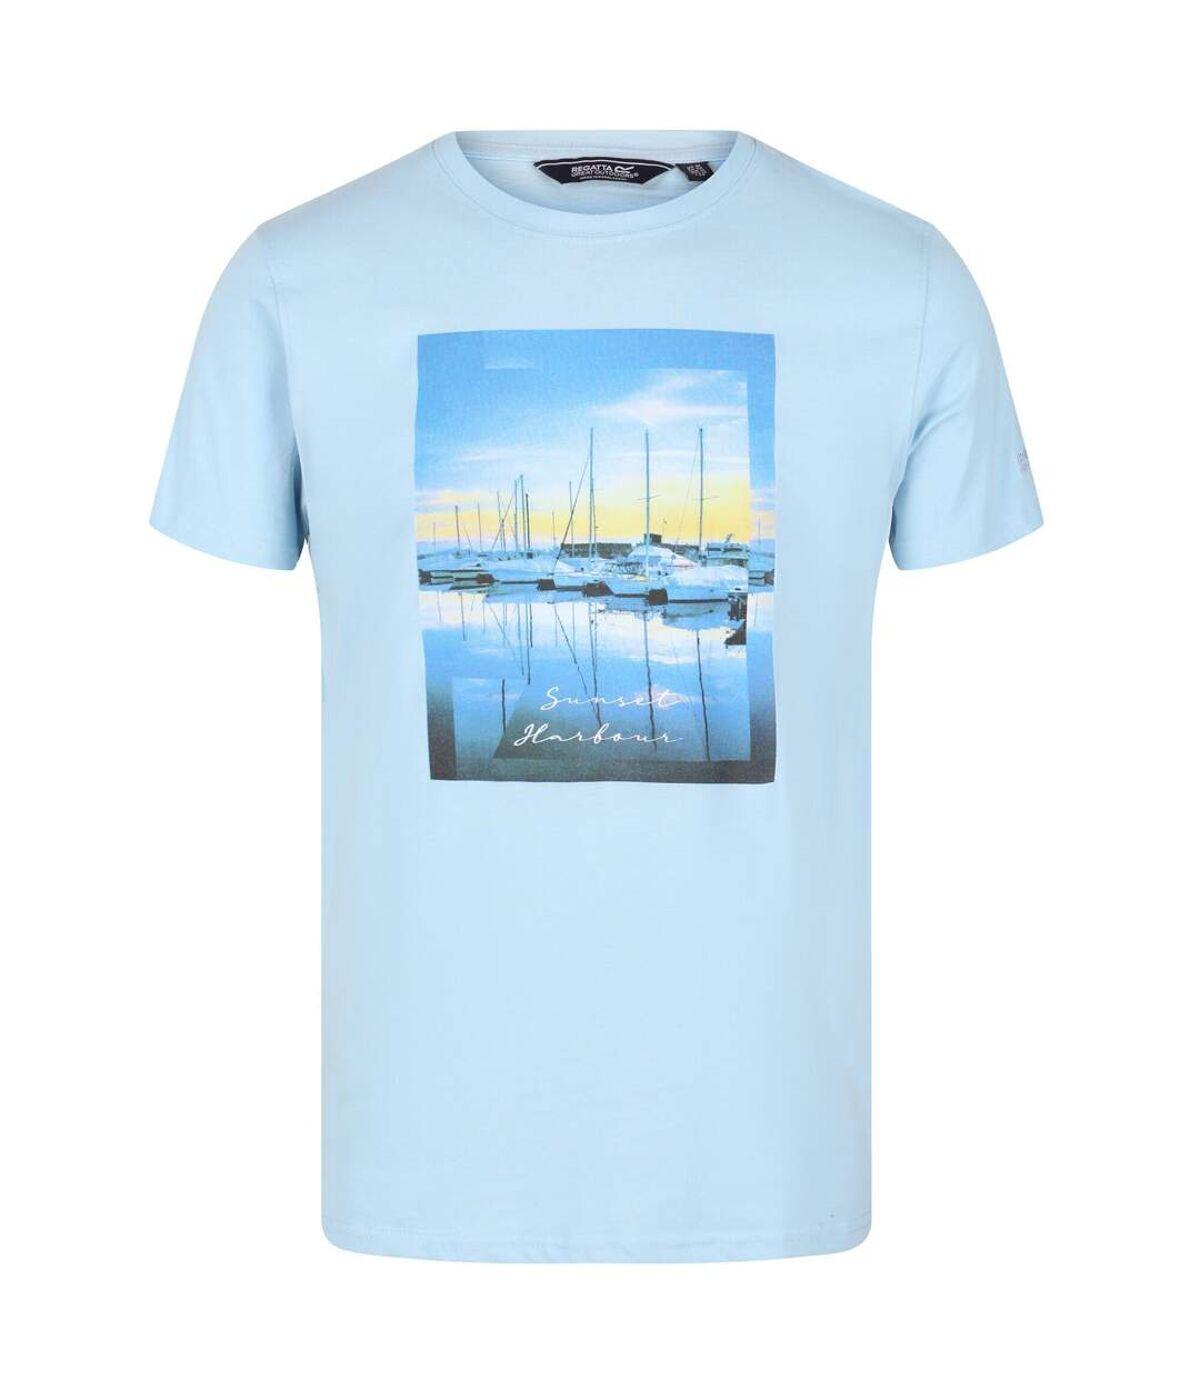 Regatta Mens Cline IV Graphic T-Shirt (Oat) - UTRG4920